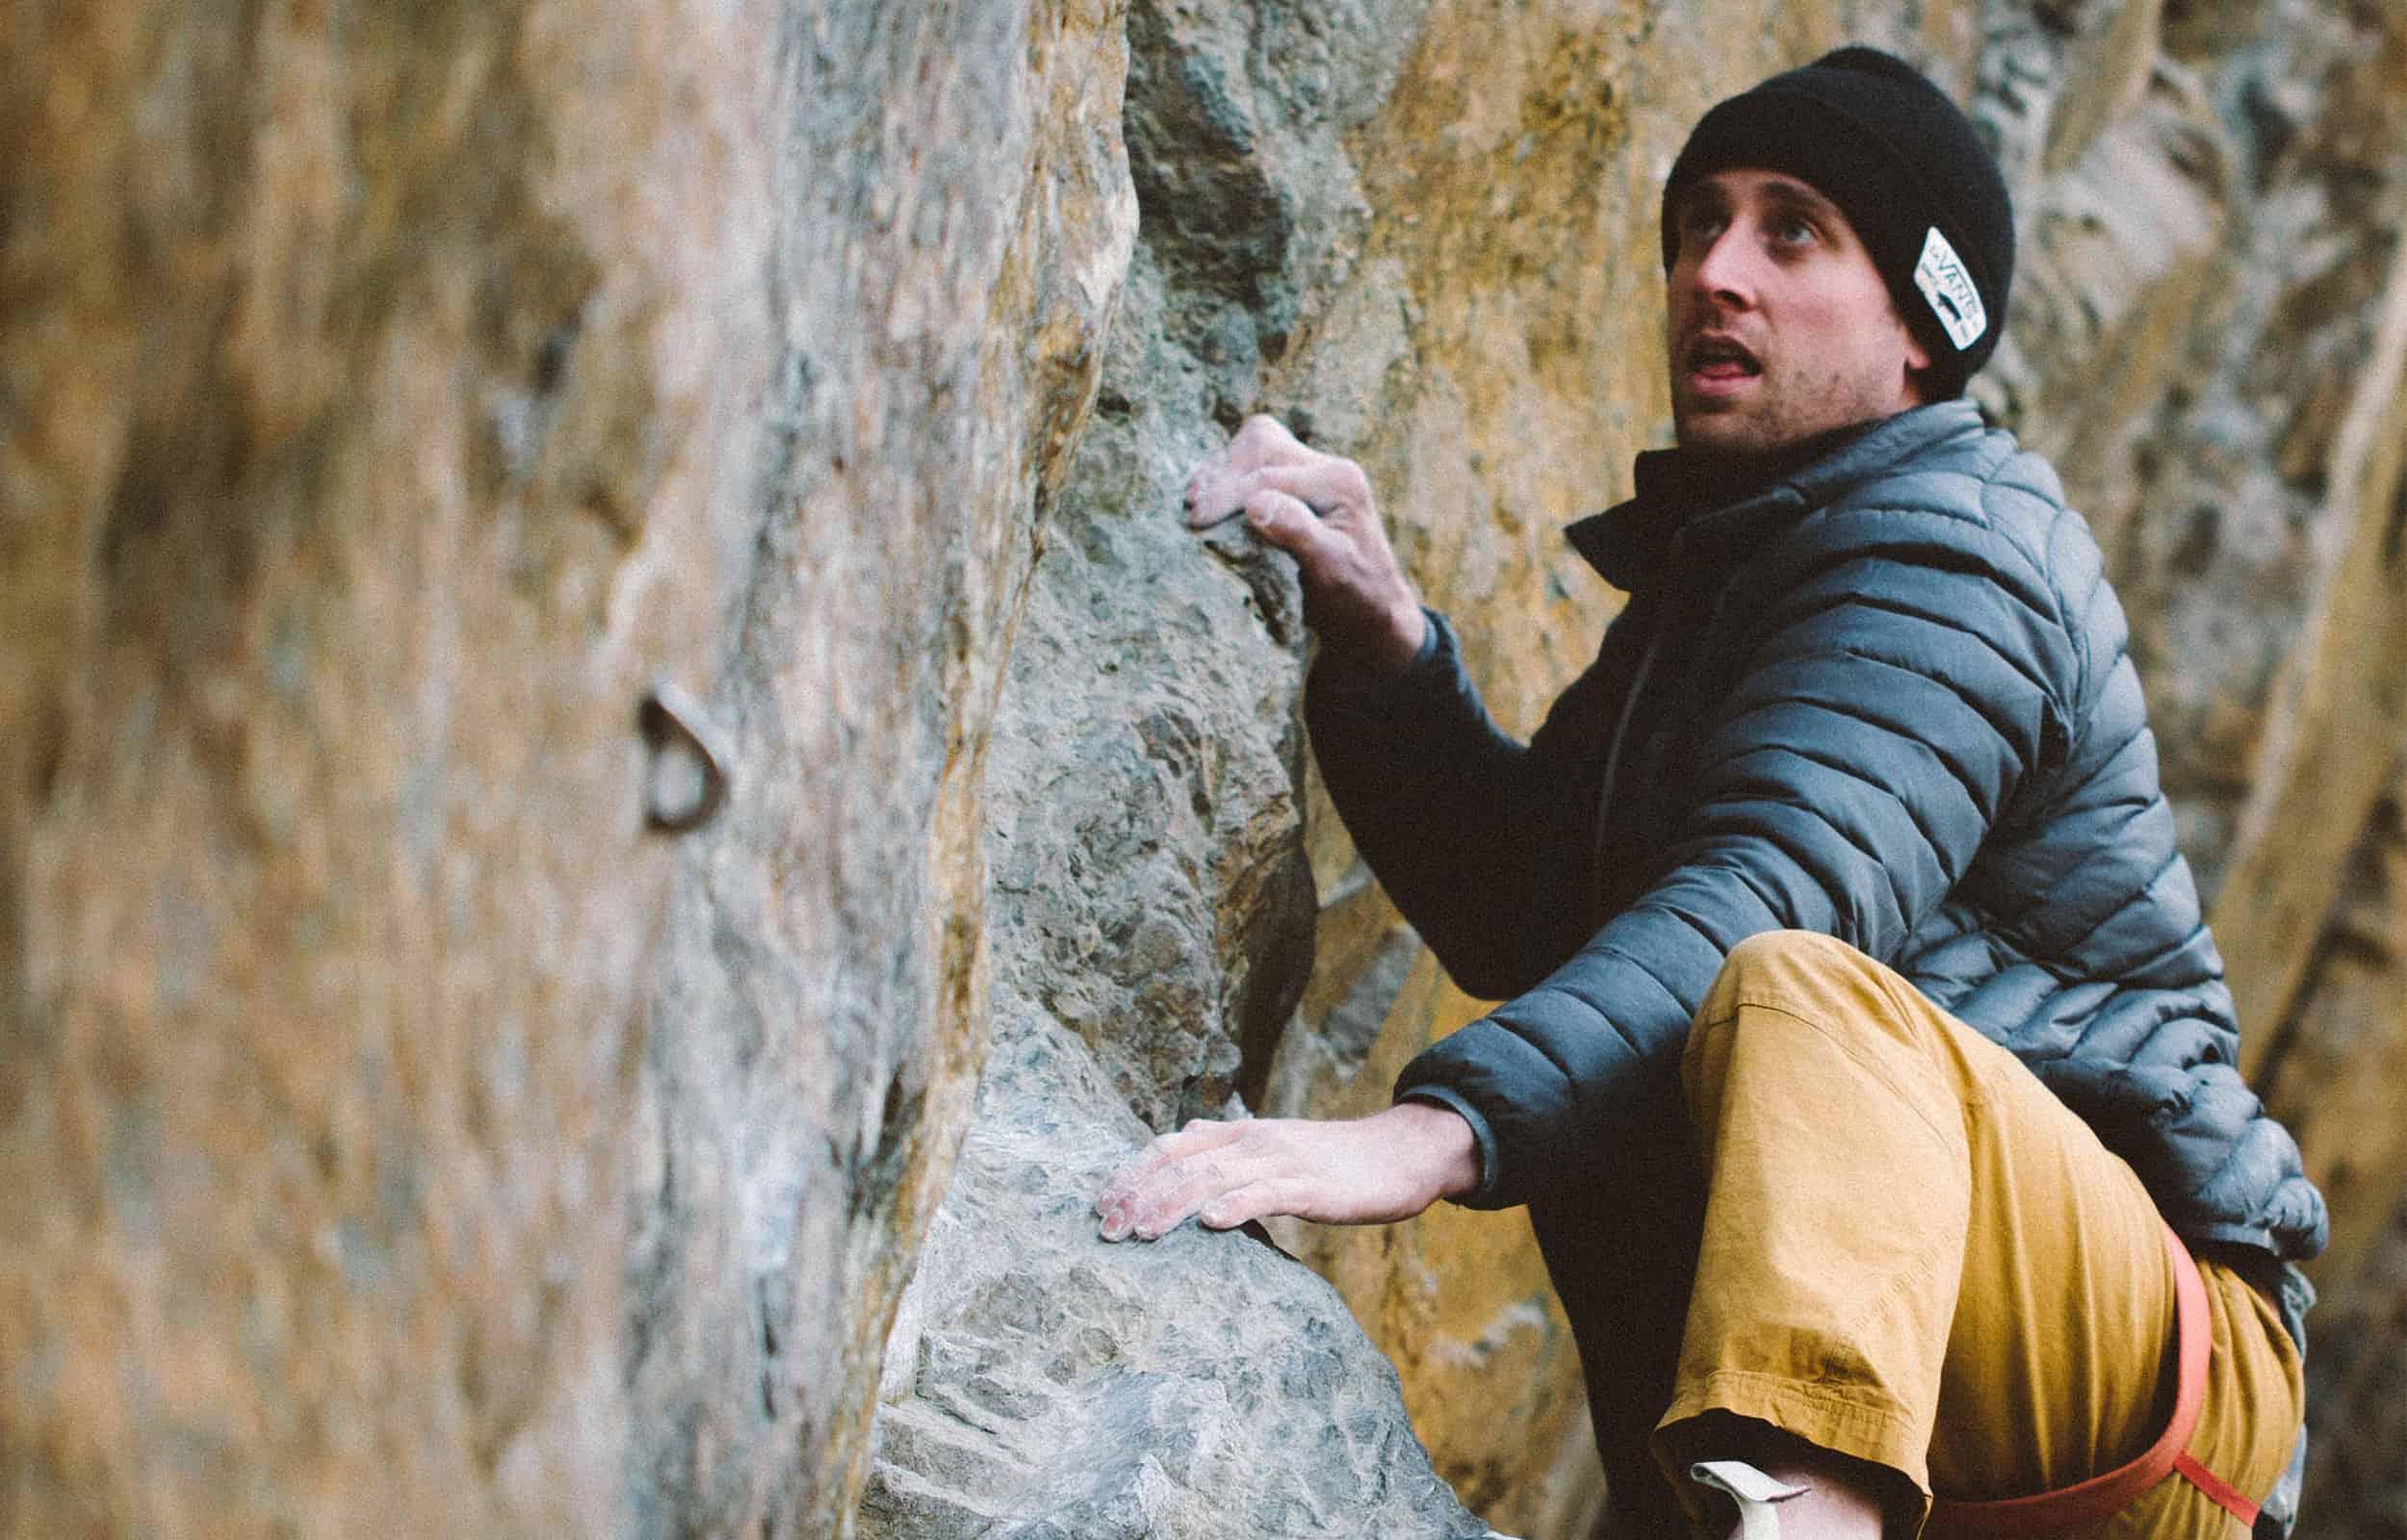 climber wearing an insulated jacket